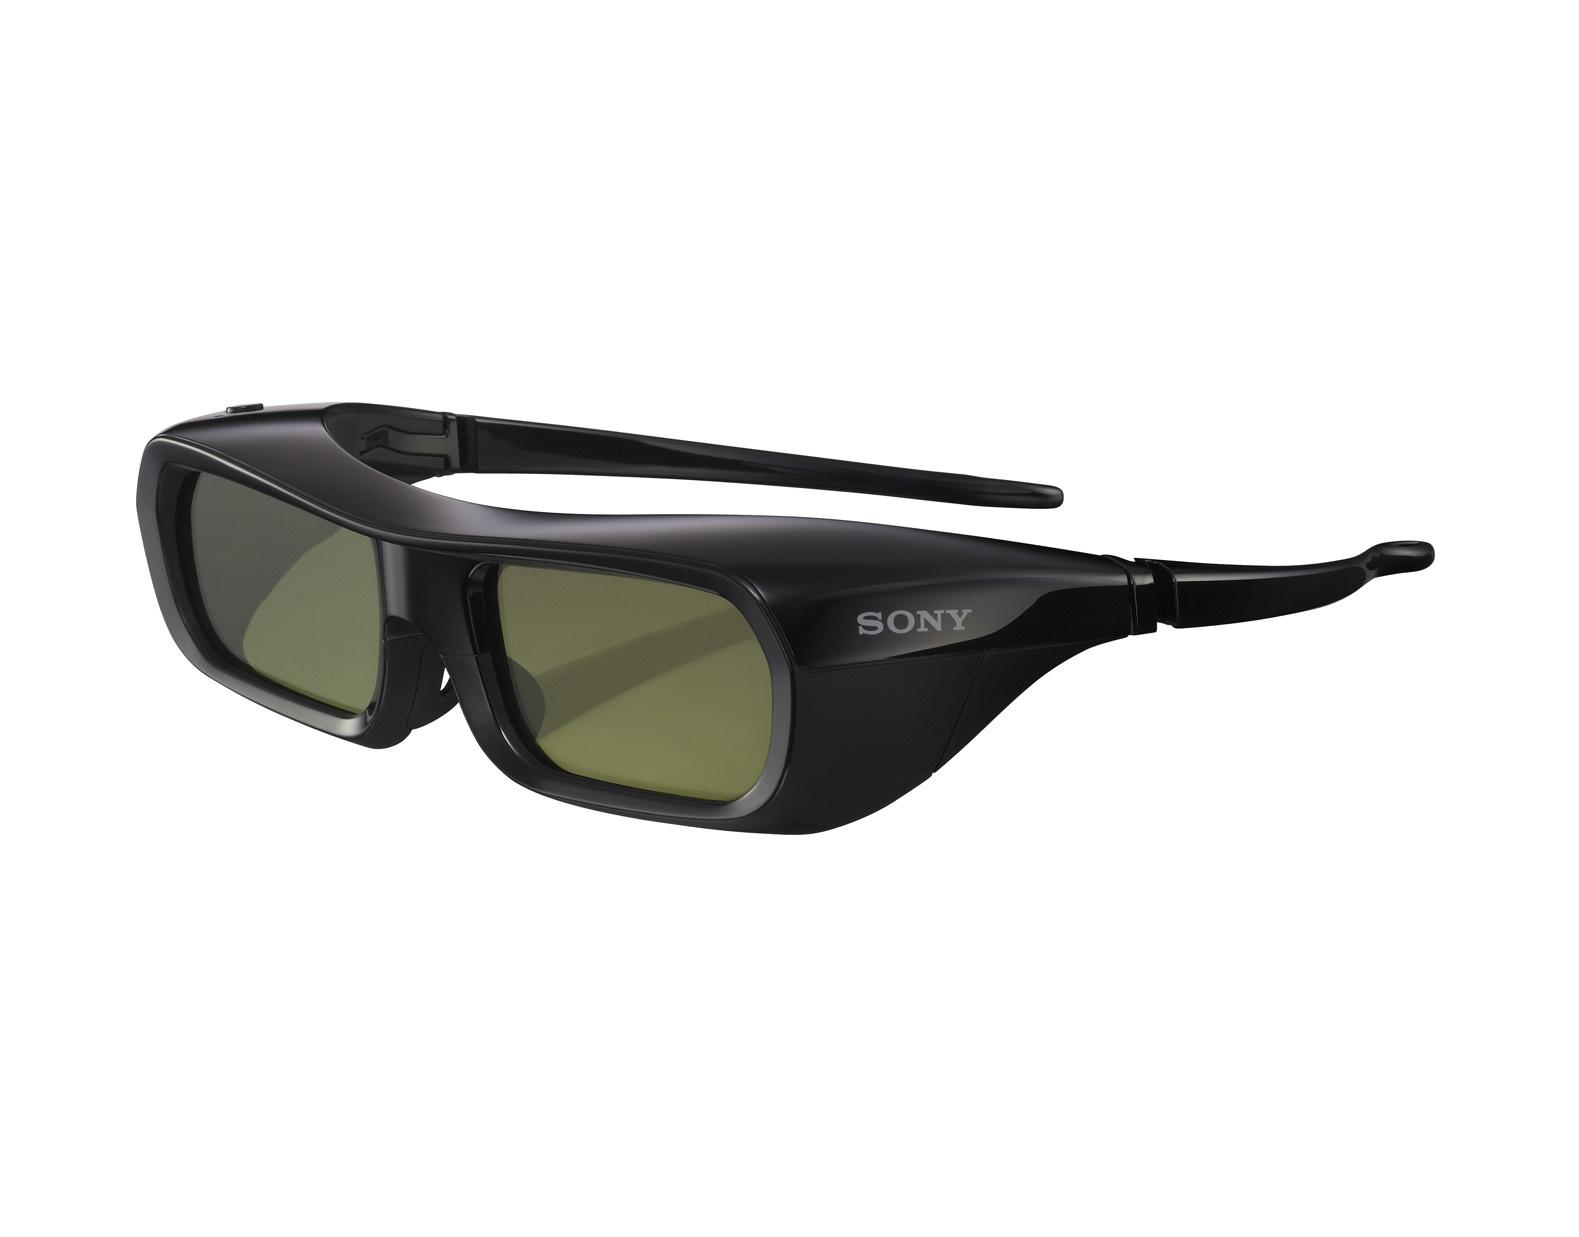 Sony TDG-PJ1 Black stereoscopic 3D glasses